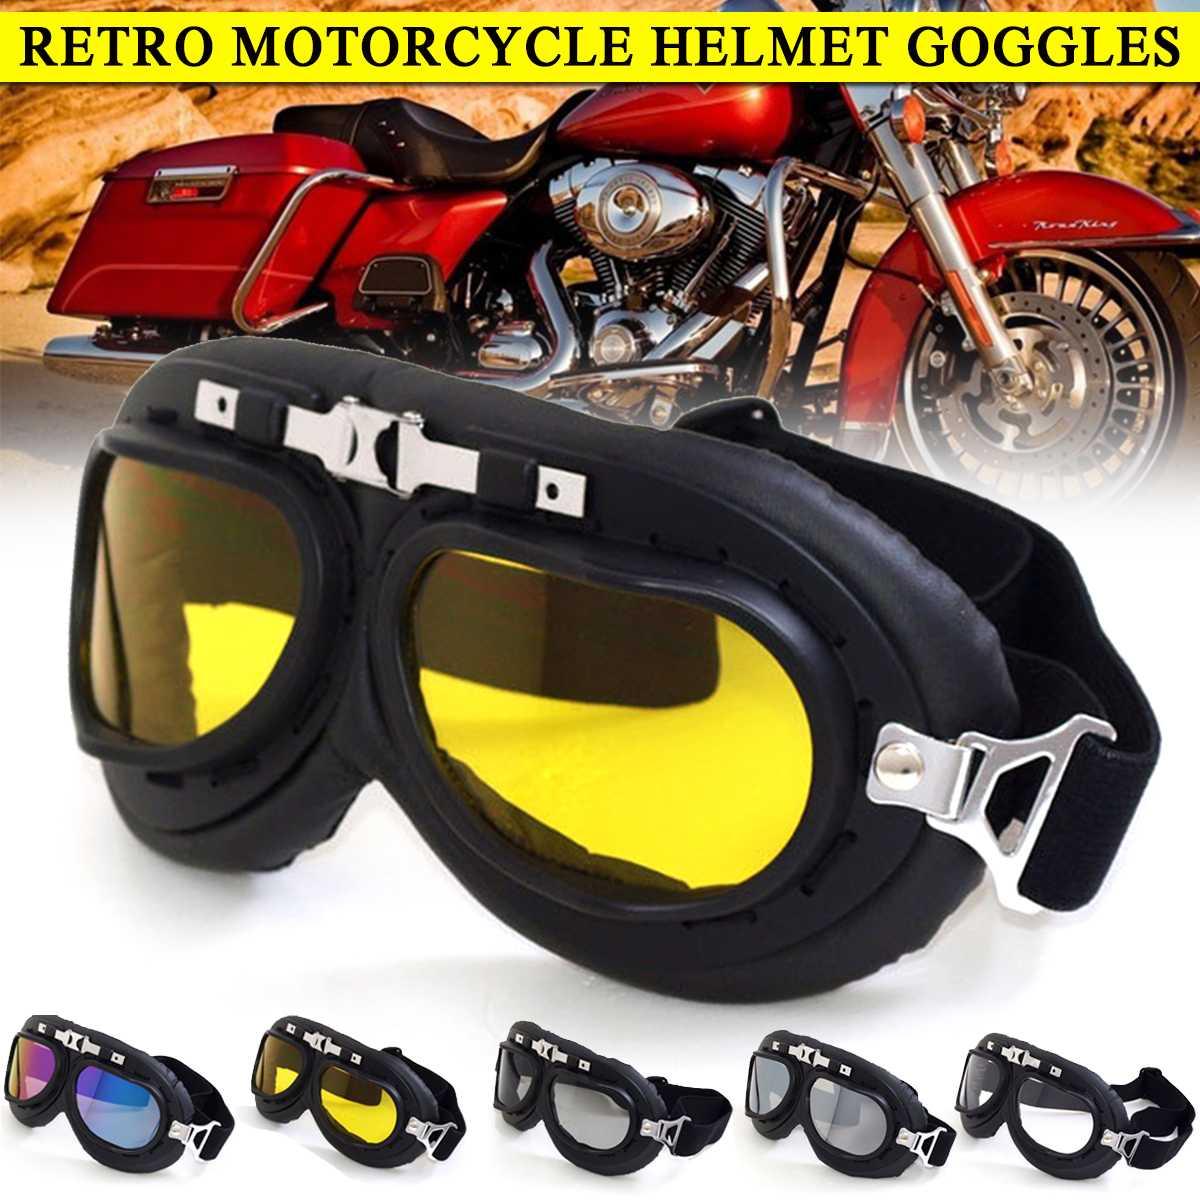 Universal Motorcycle Goggles Glasses Vintage Helmet Glasses Goggle Biker ATV Cycling Ski Sunglasses Men Women